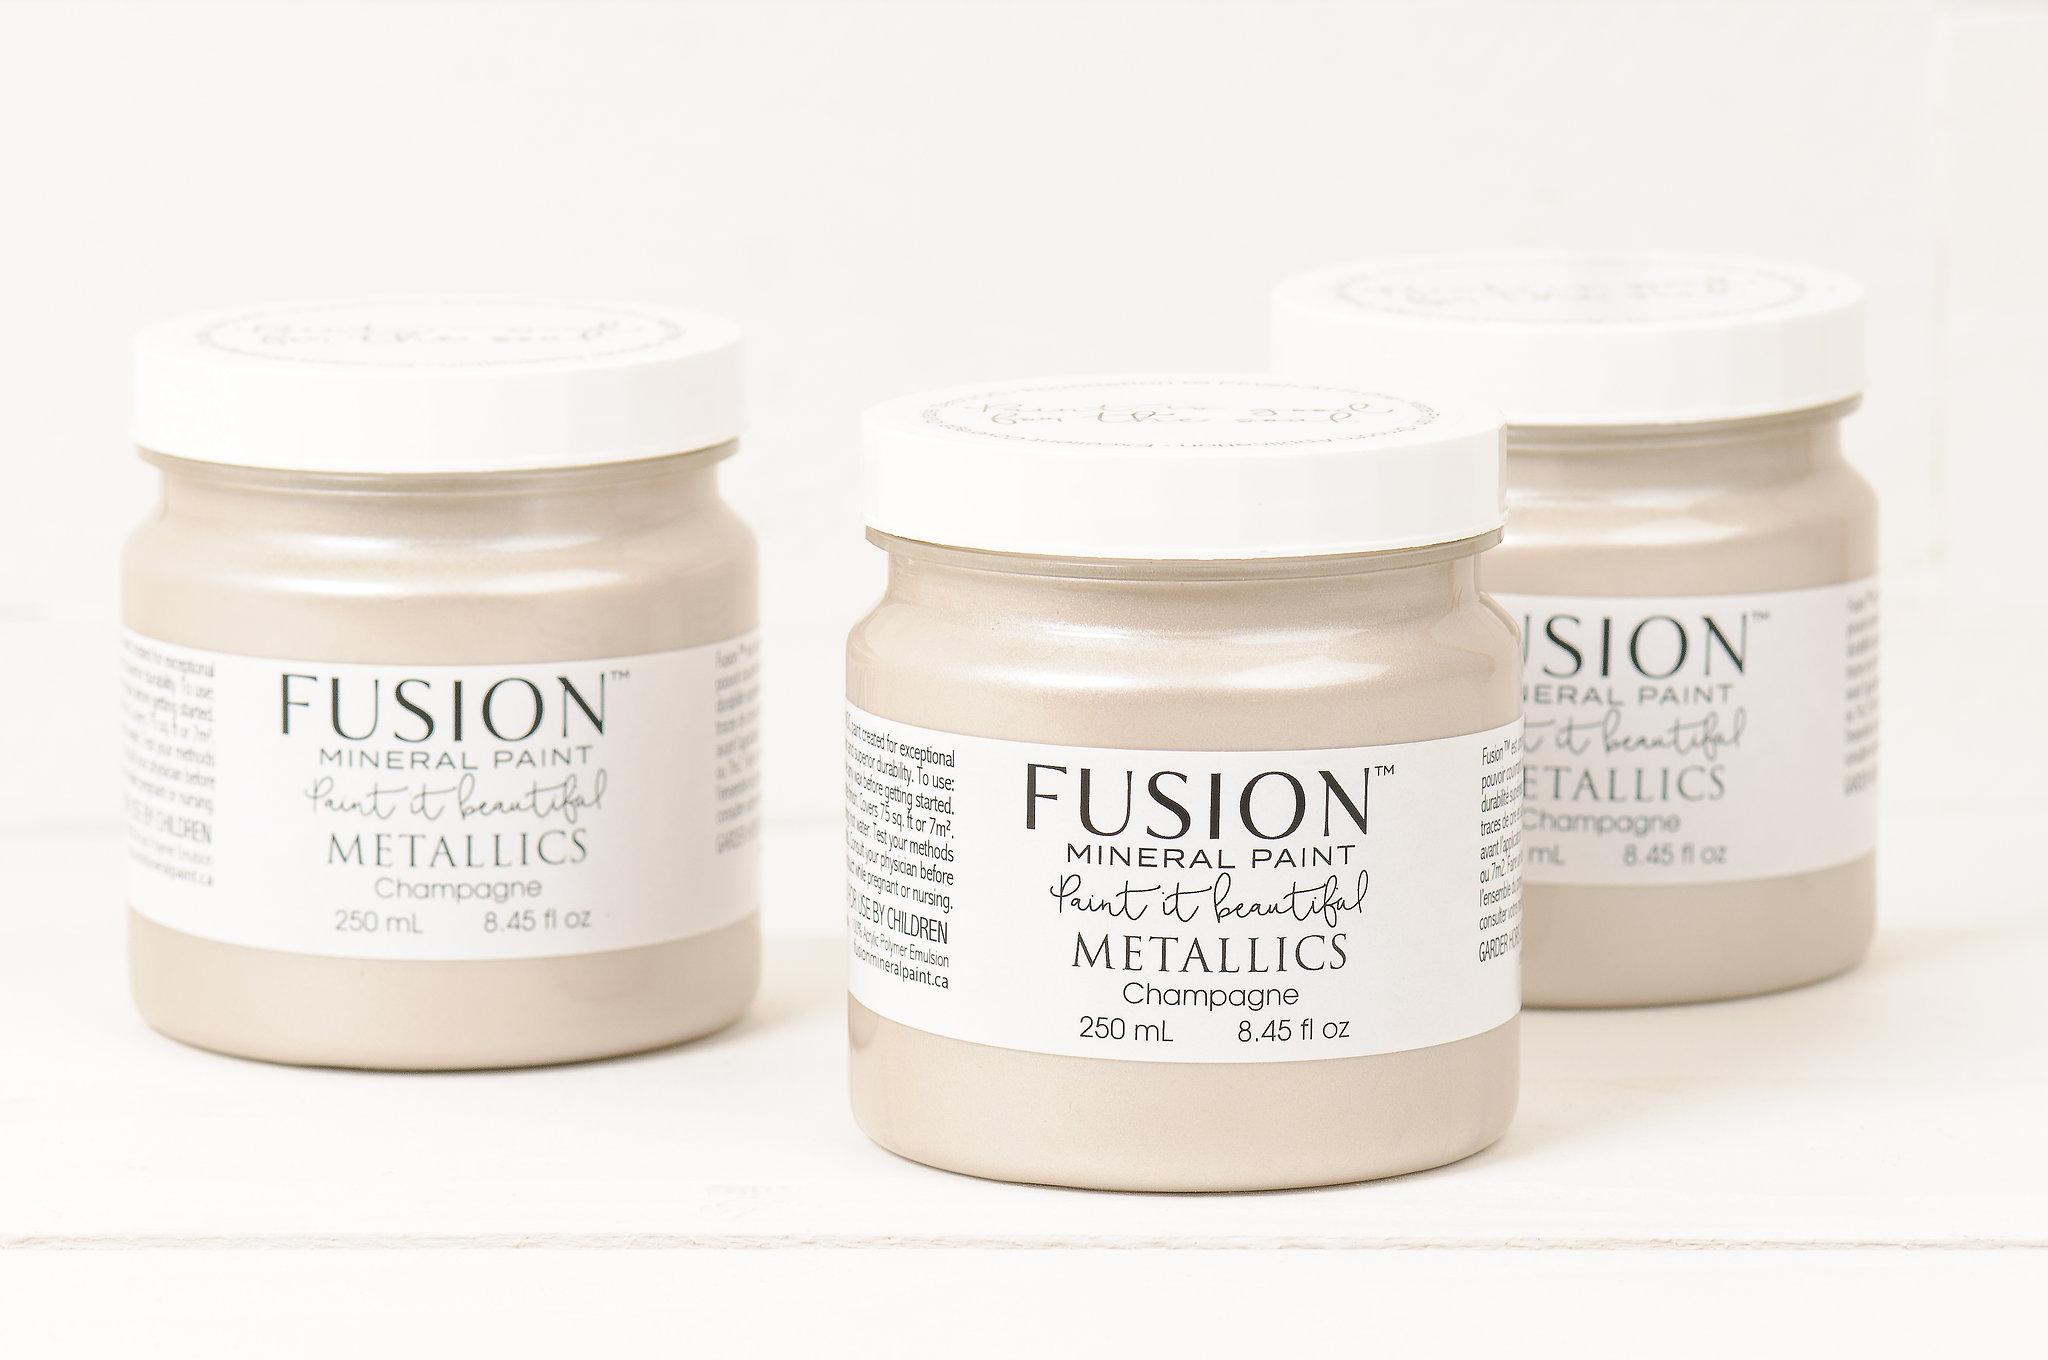 Fusion™ Metallics Champagne